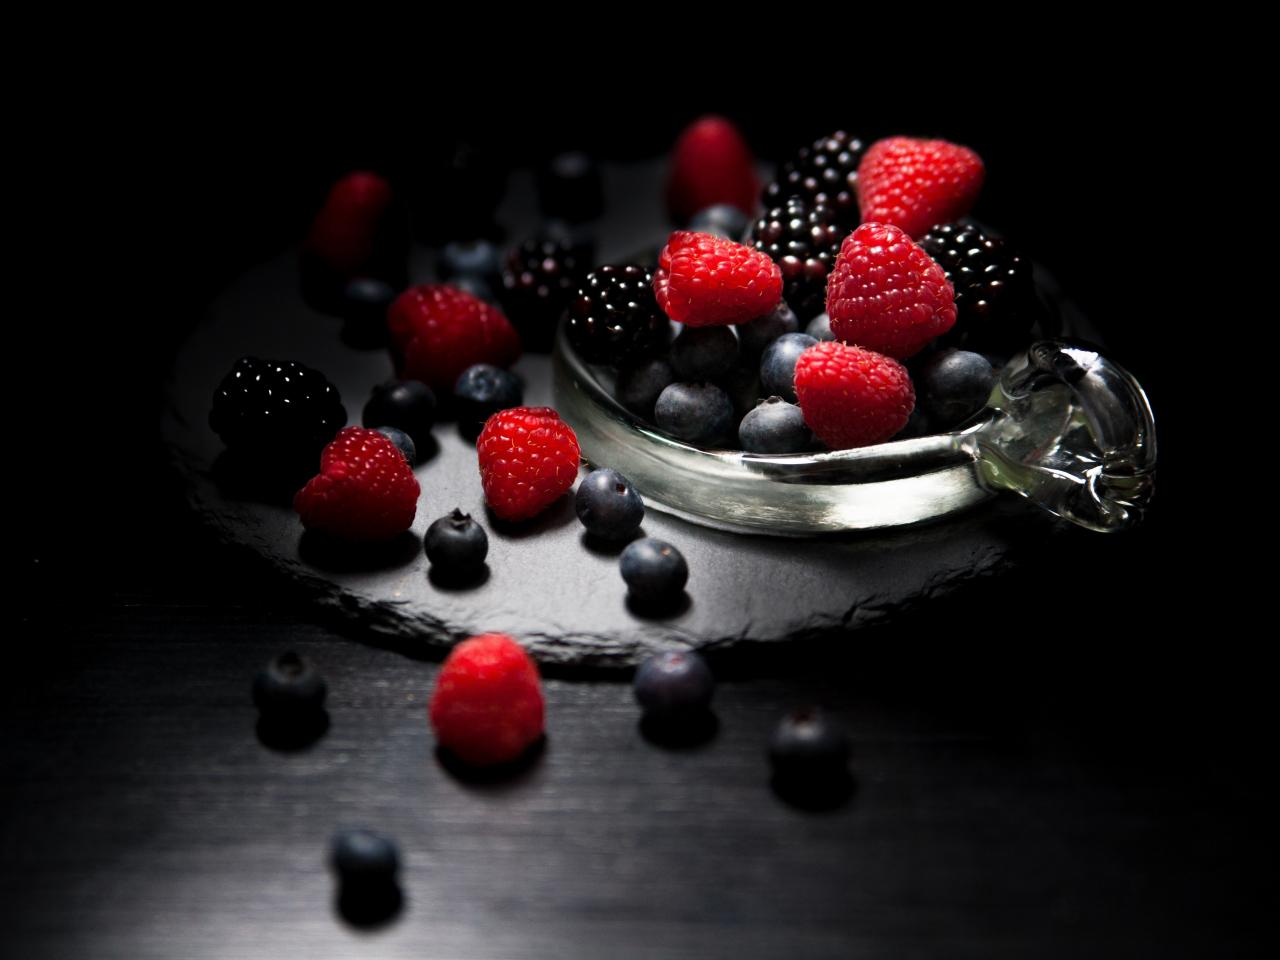 Dark mood, food, fruits, Raspberry, blueberry, Blackberry, 1280x960 wallpaper